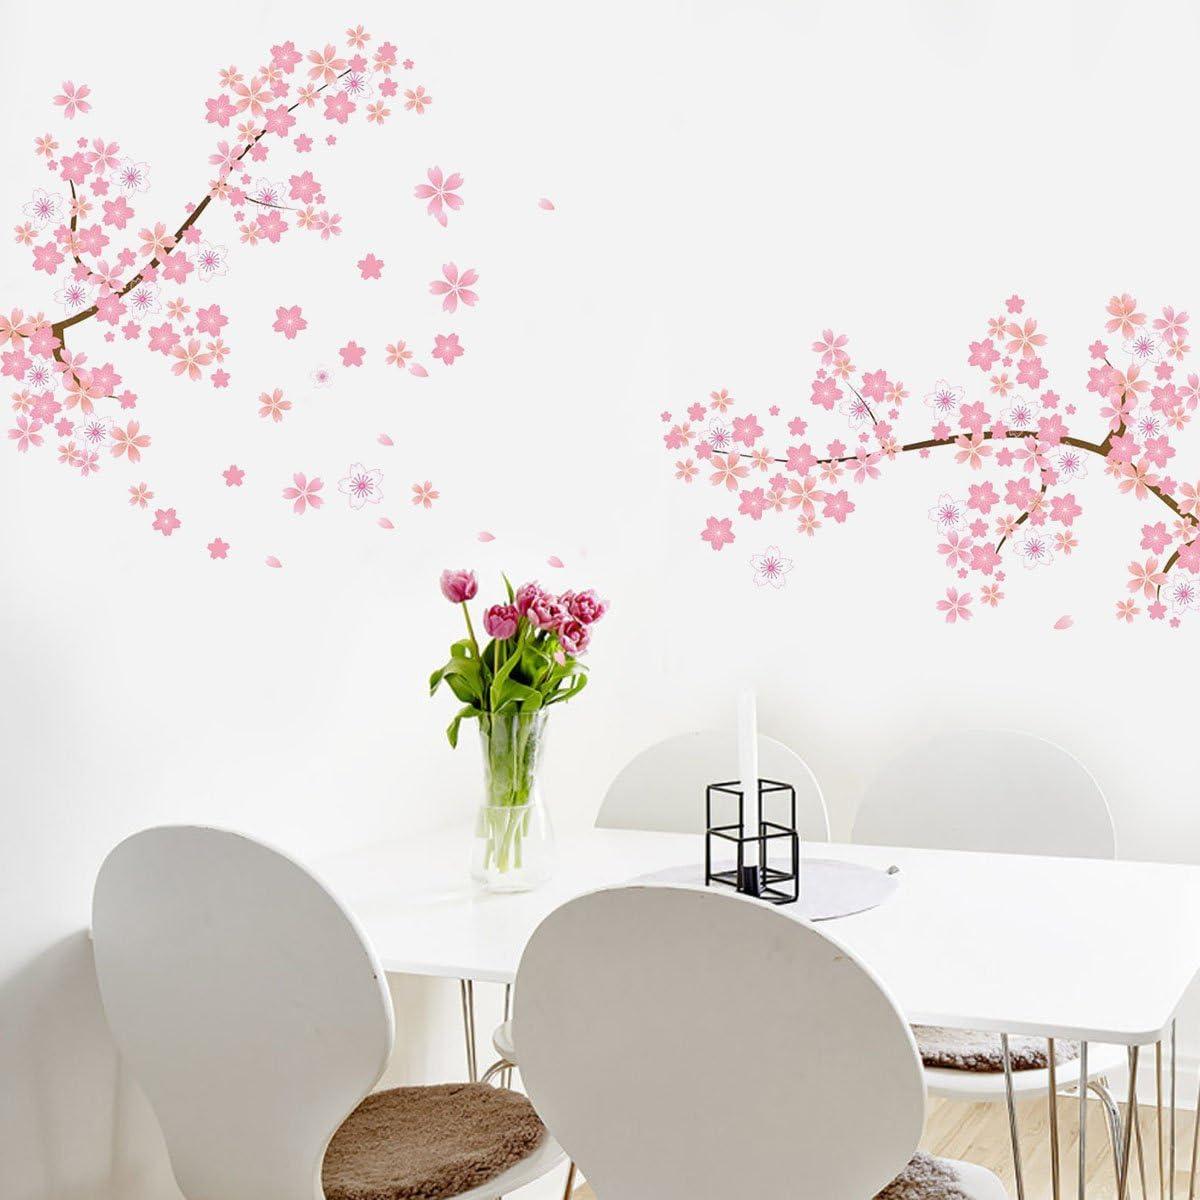 Amazon ウォールステッカー 桜 壁紙 桜吹雪 満開の桜 Wall Sticker ウォールペーパー 壁シール花 ウォールシール 60 90cm ウォールステッカー オンライン通販